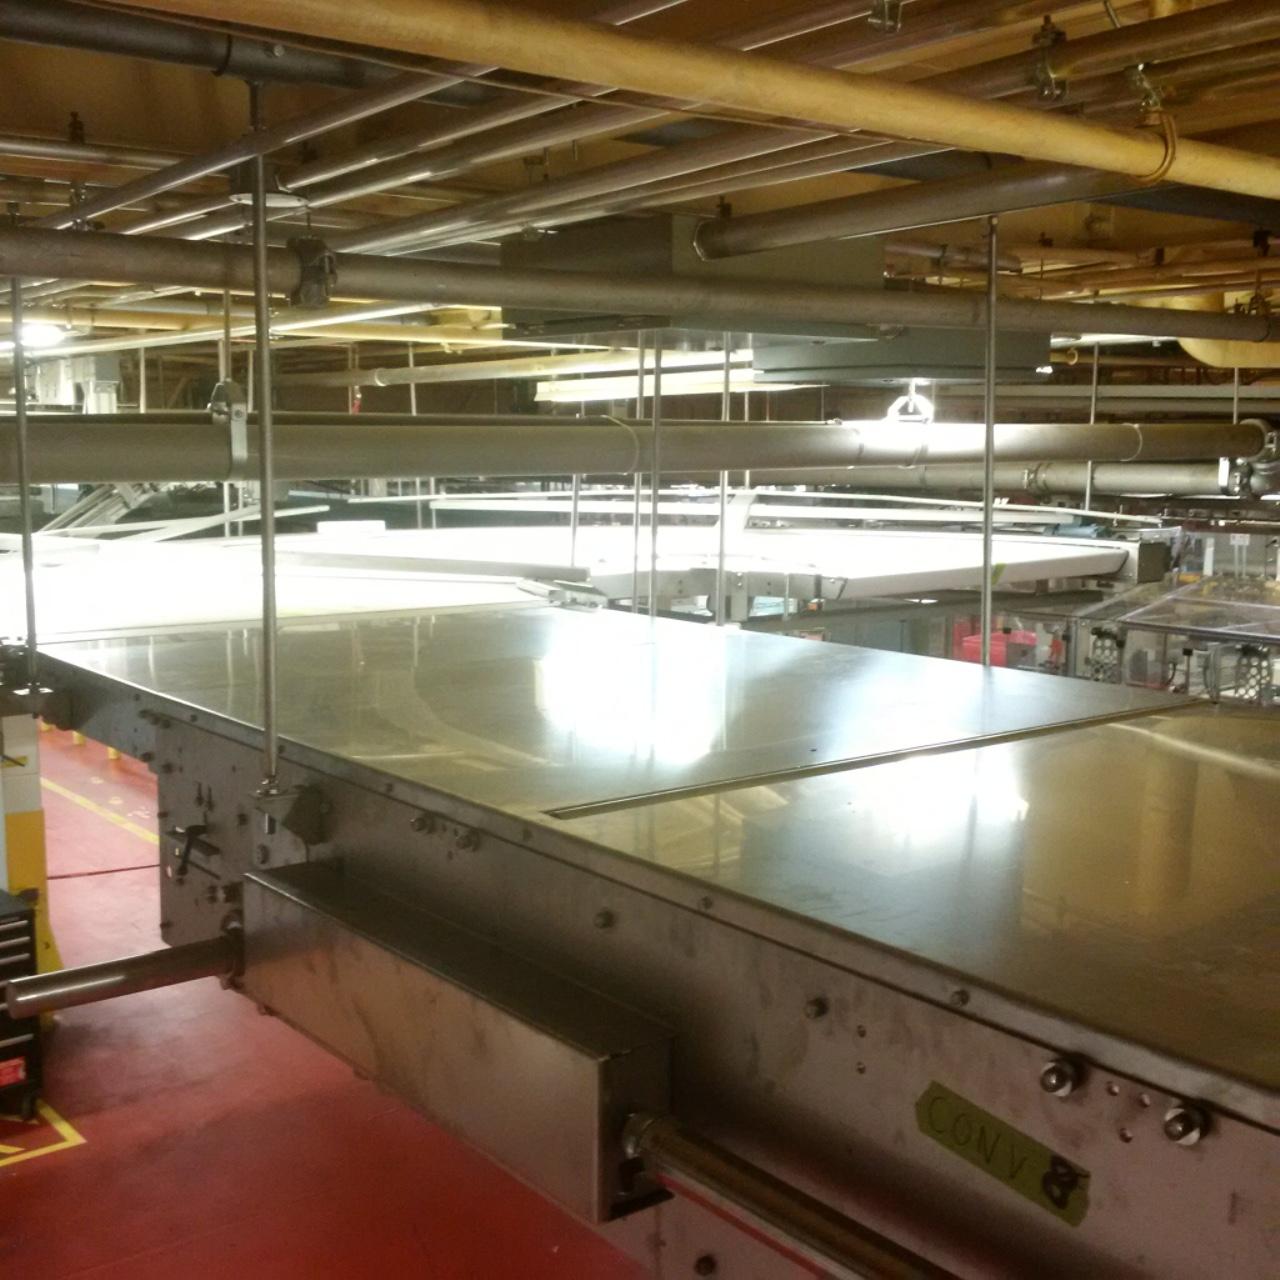 Upgrading Bakery Conveyors at Mondelez